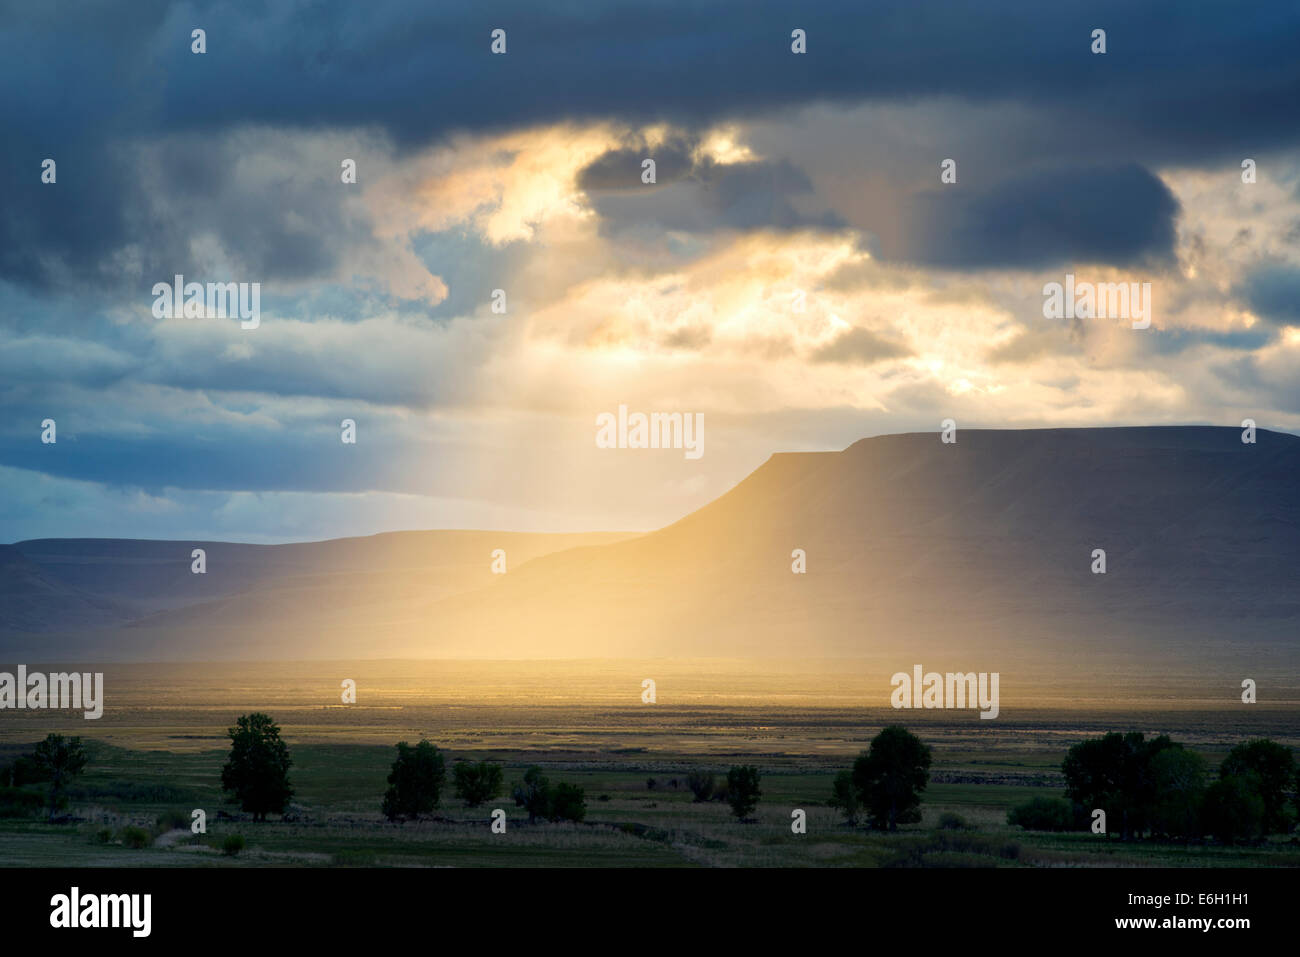 Sunburst durch Wolken im Harney County, Oregon. Stockbild